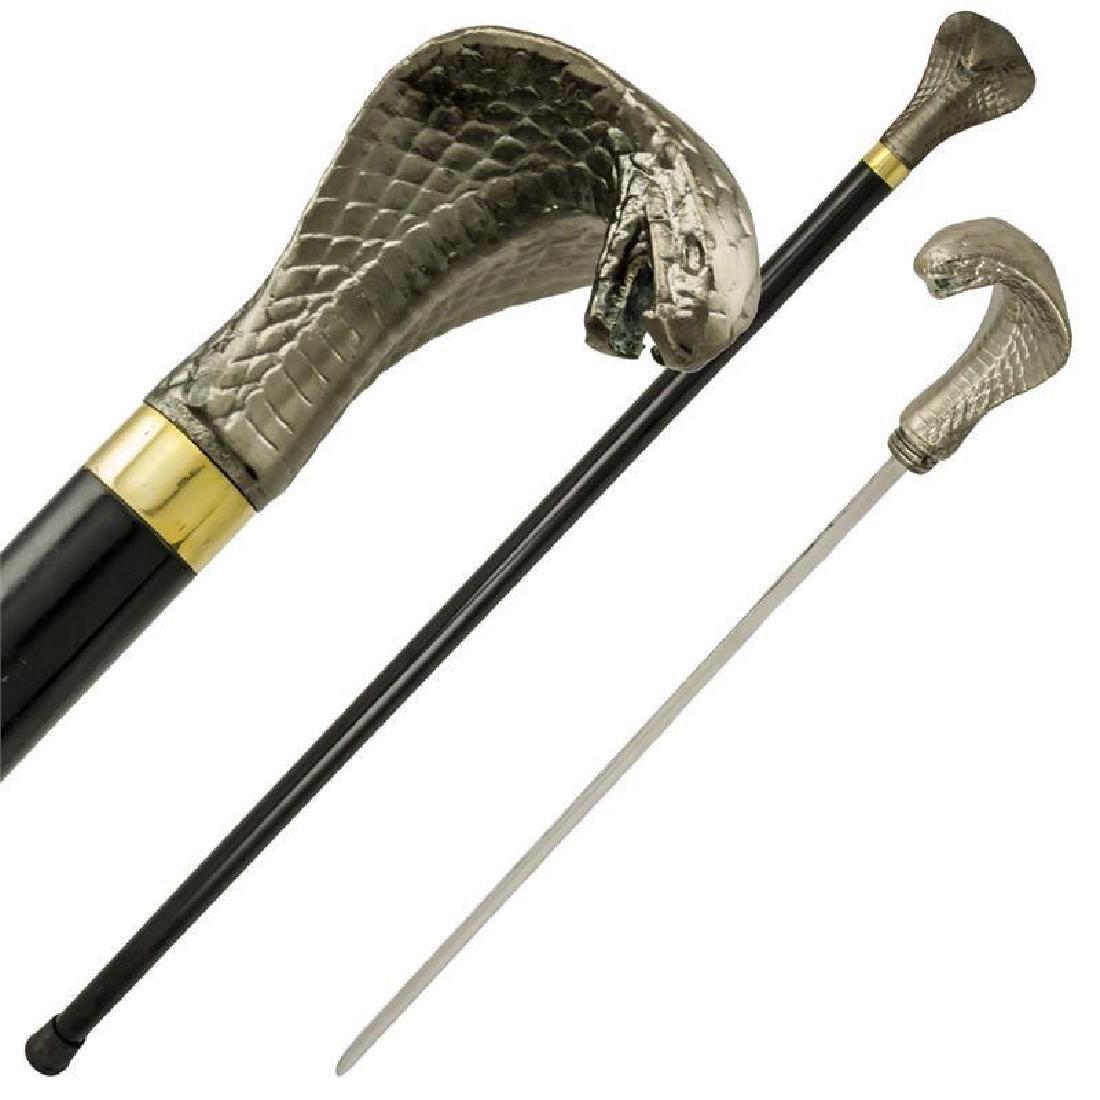 Cobra Head Walking Cane Sword